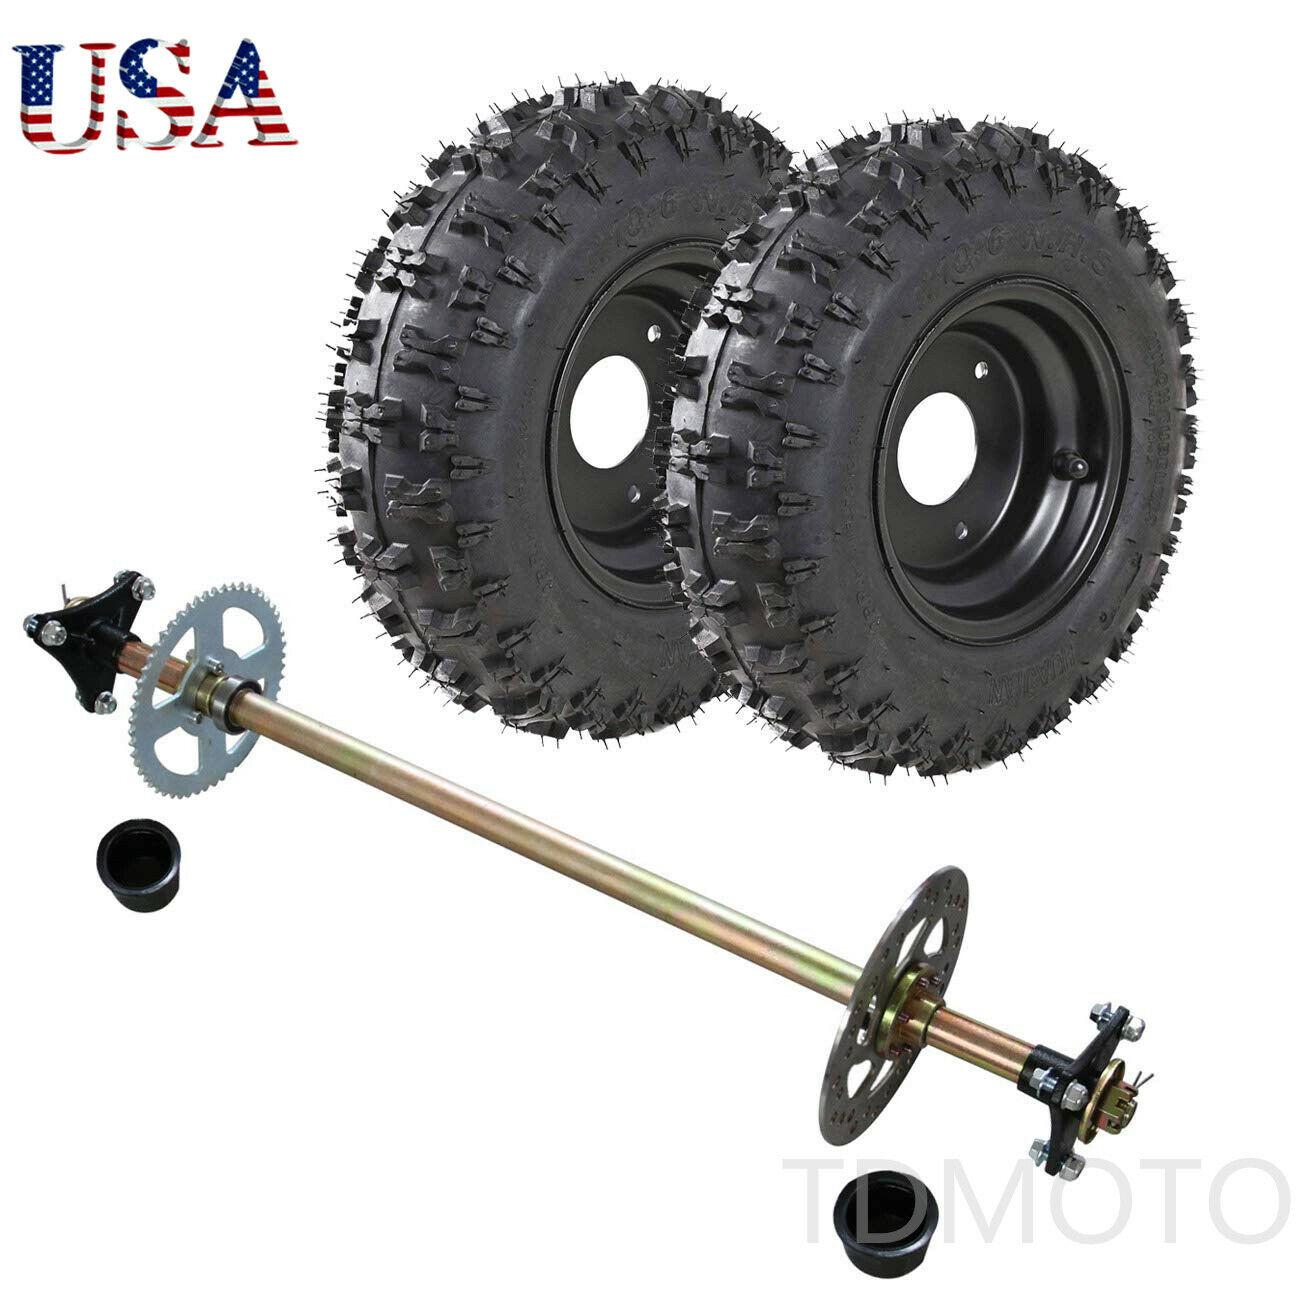 Go Kart Rear Axle Kit Hub Complete Wheels 4 10